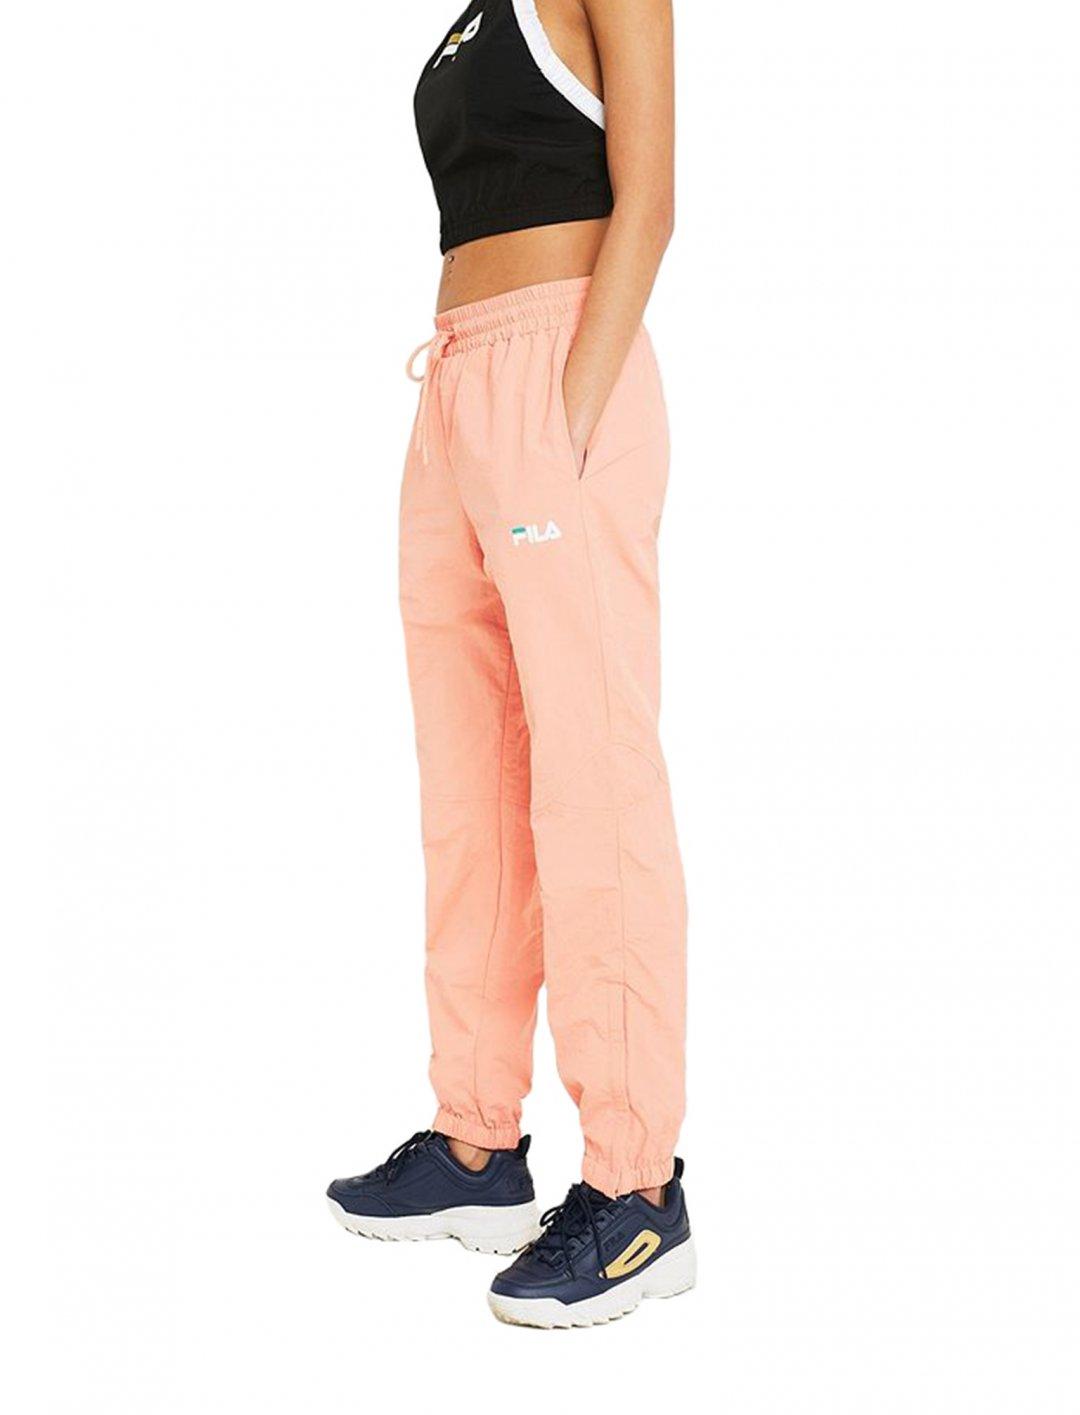 "Fila Slim Track Pants {""id"":5,""product_section_id"":1,""name"":""Clothing"",""order"":5} Fila"